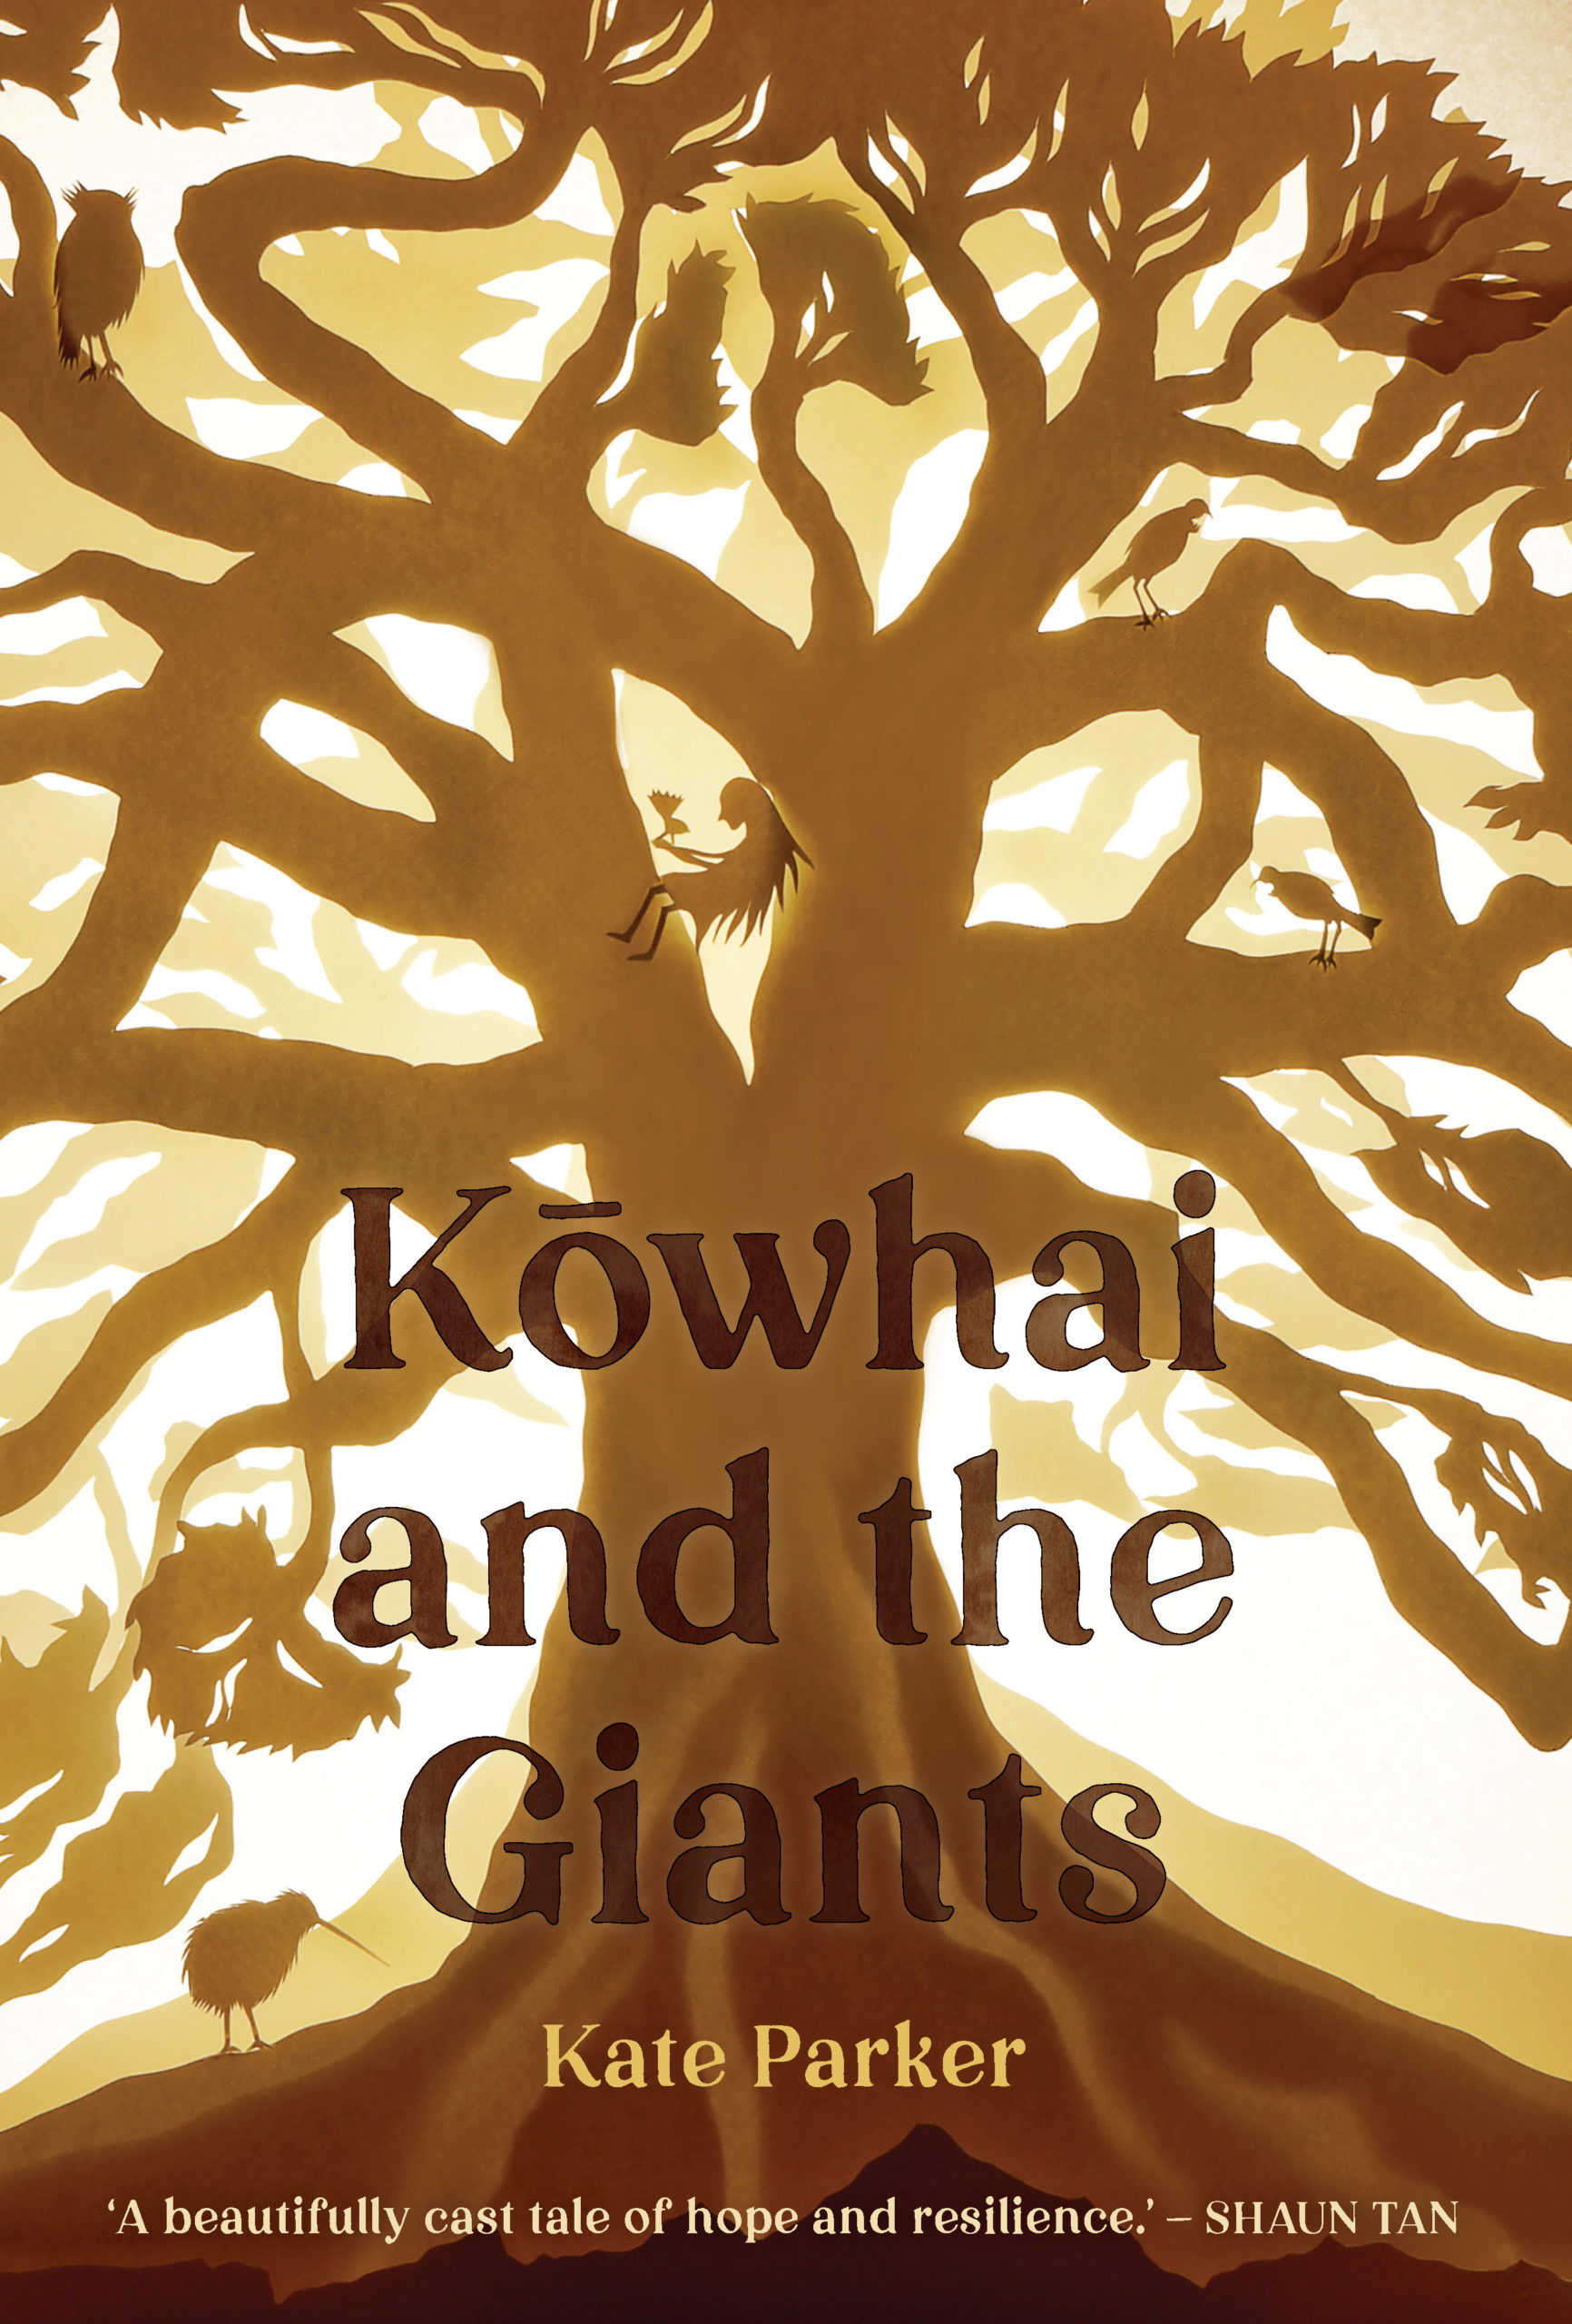 Kōwhai and the Giants